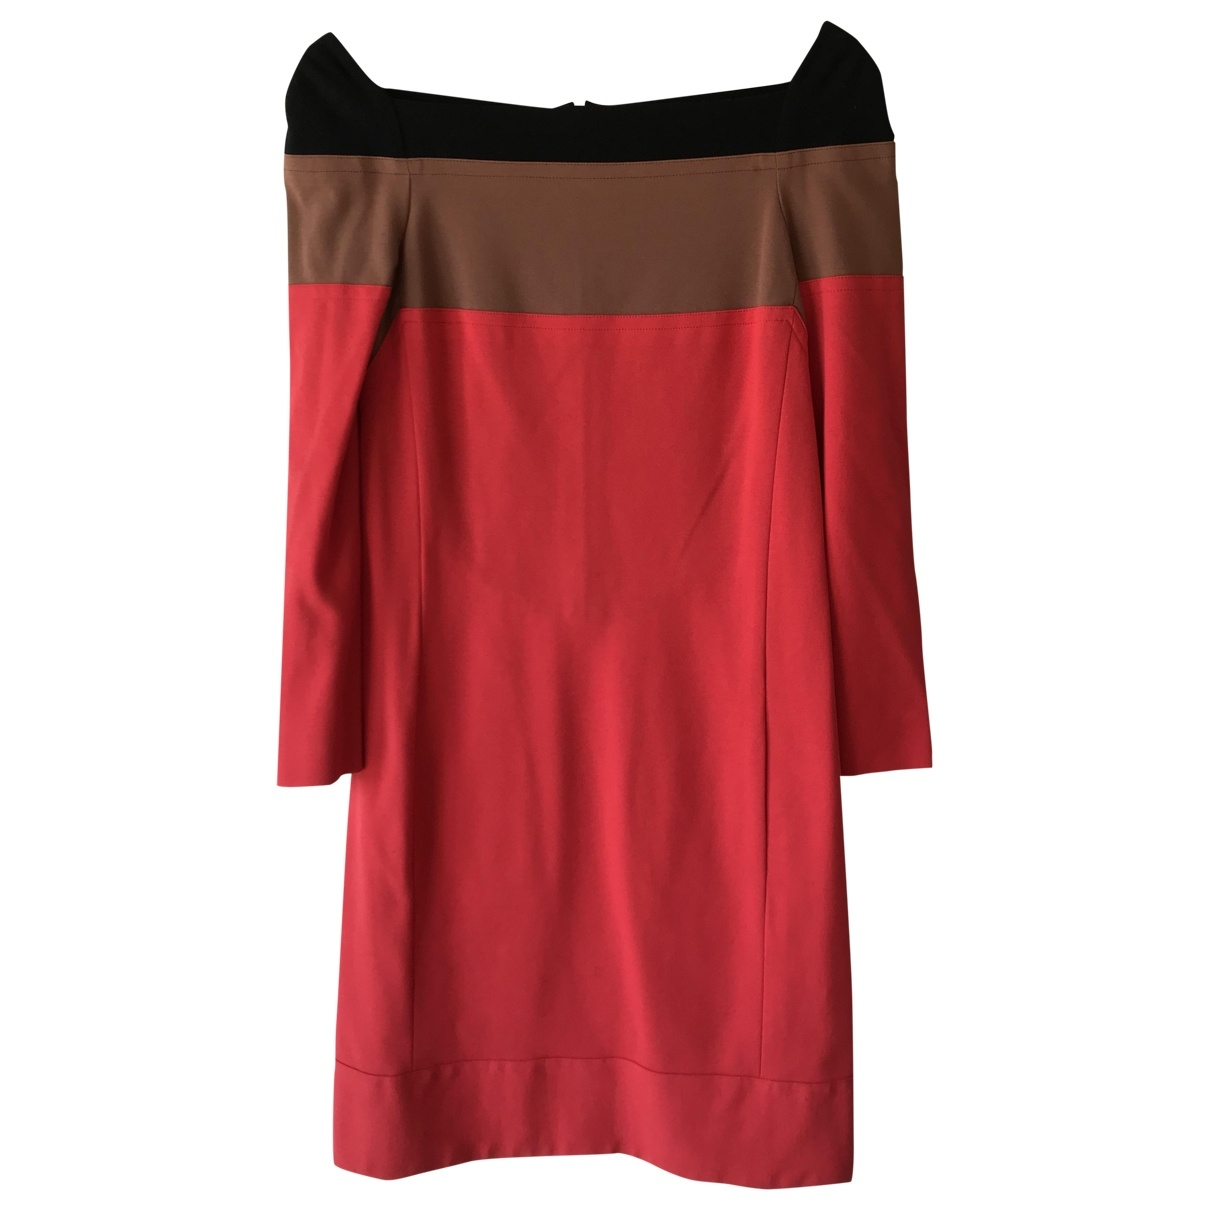 Sonia Rykiel - Robe   pour femme en coton